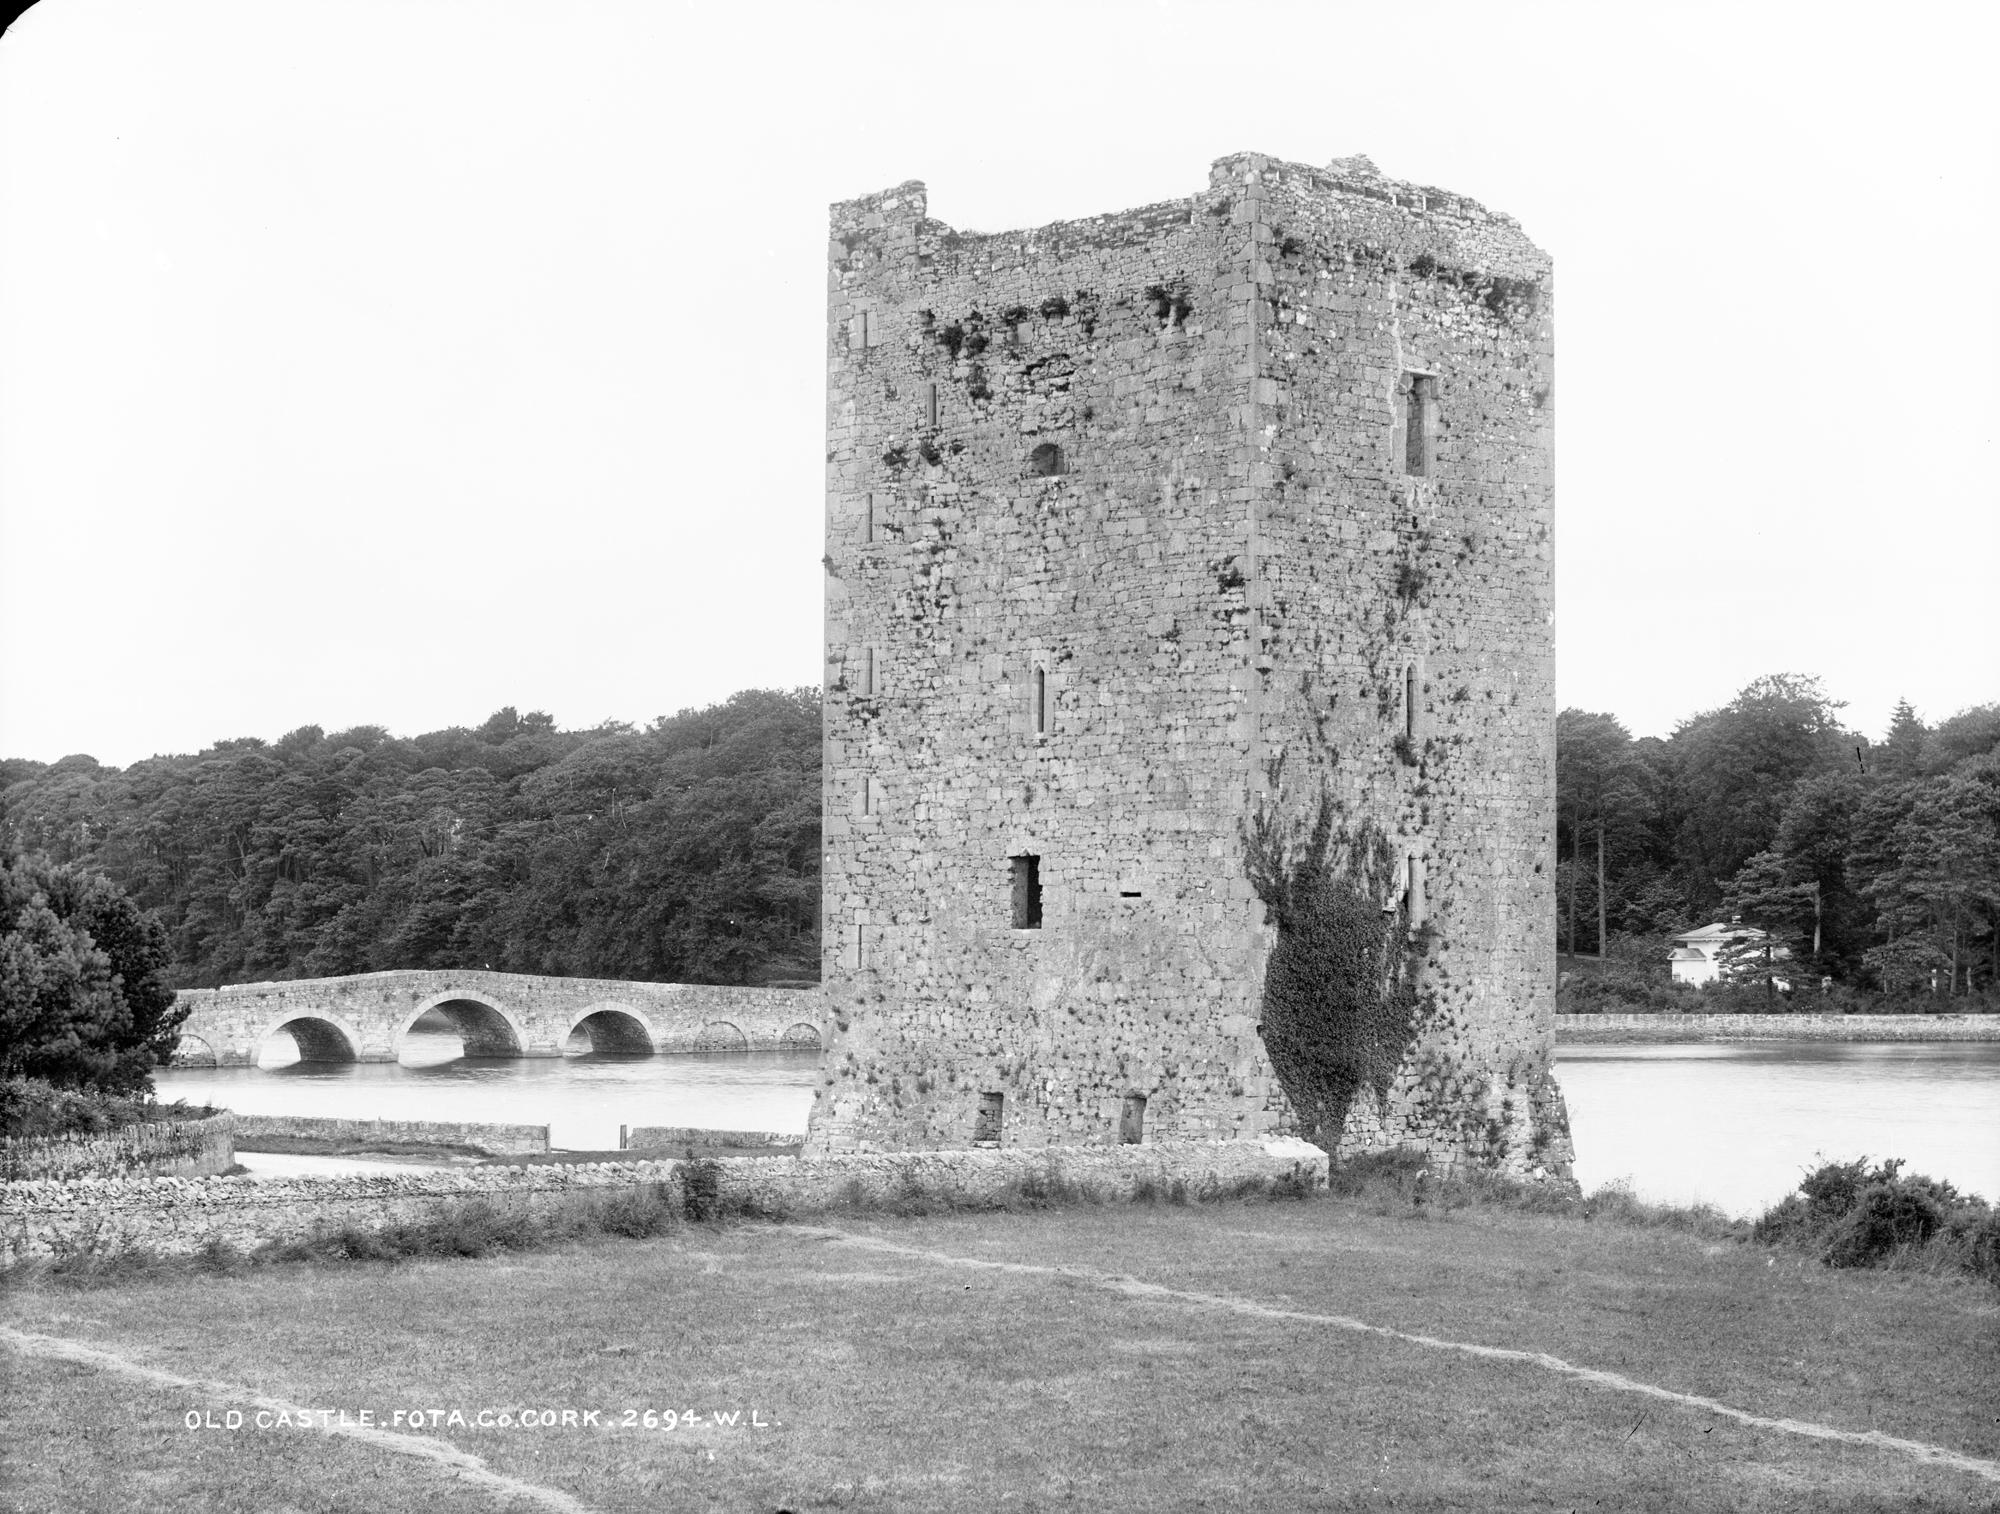 Belvelly Castle, Fota, Co. Cork